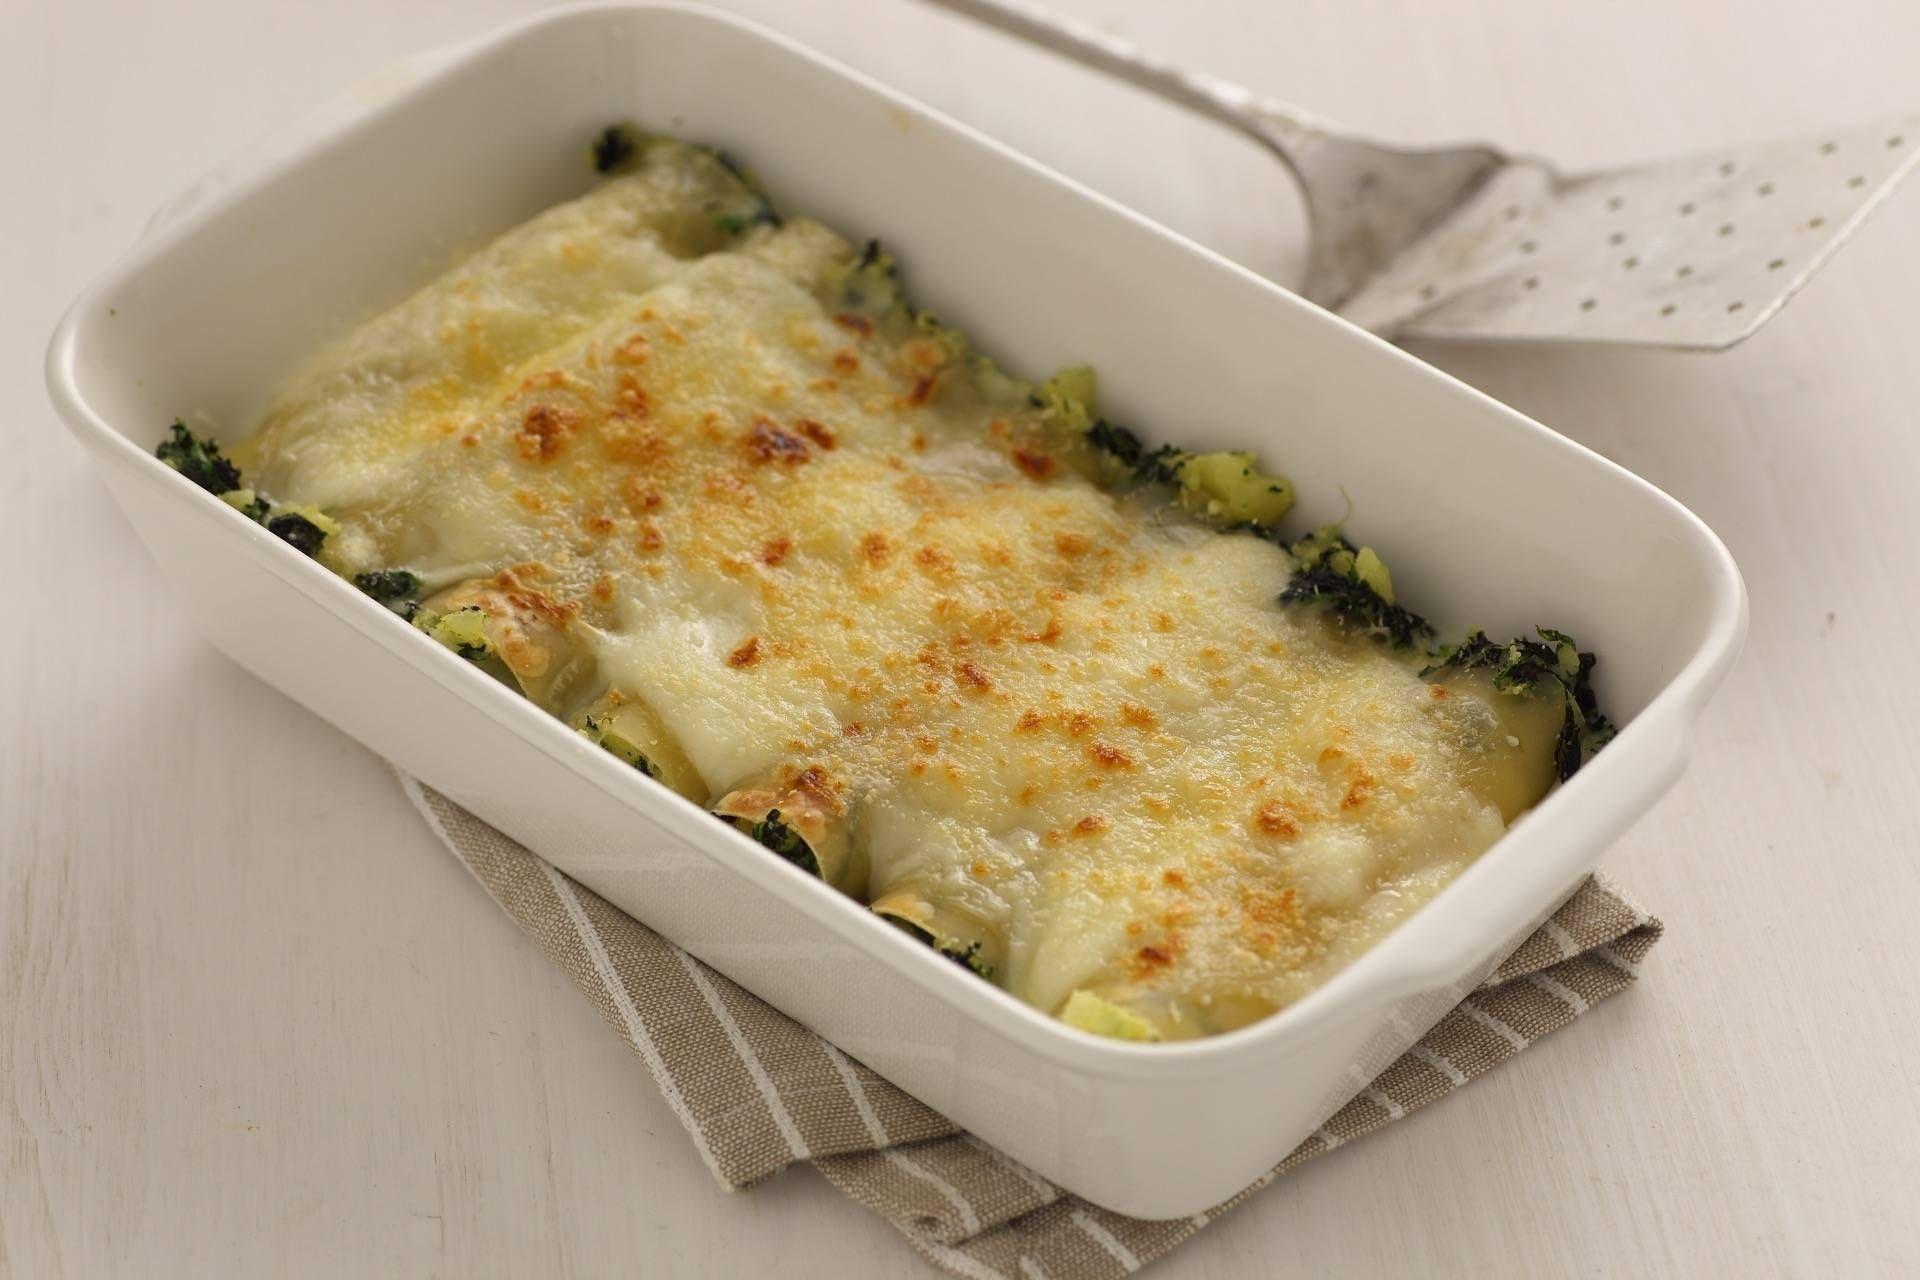 Cannelloni patate, spinaci e panna - Parmalat